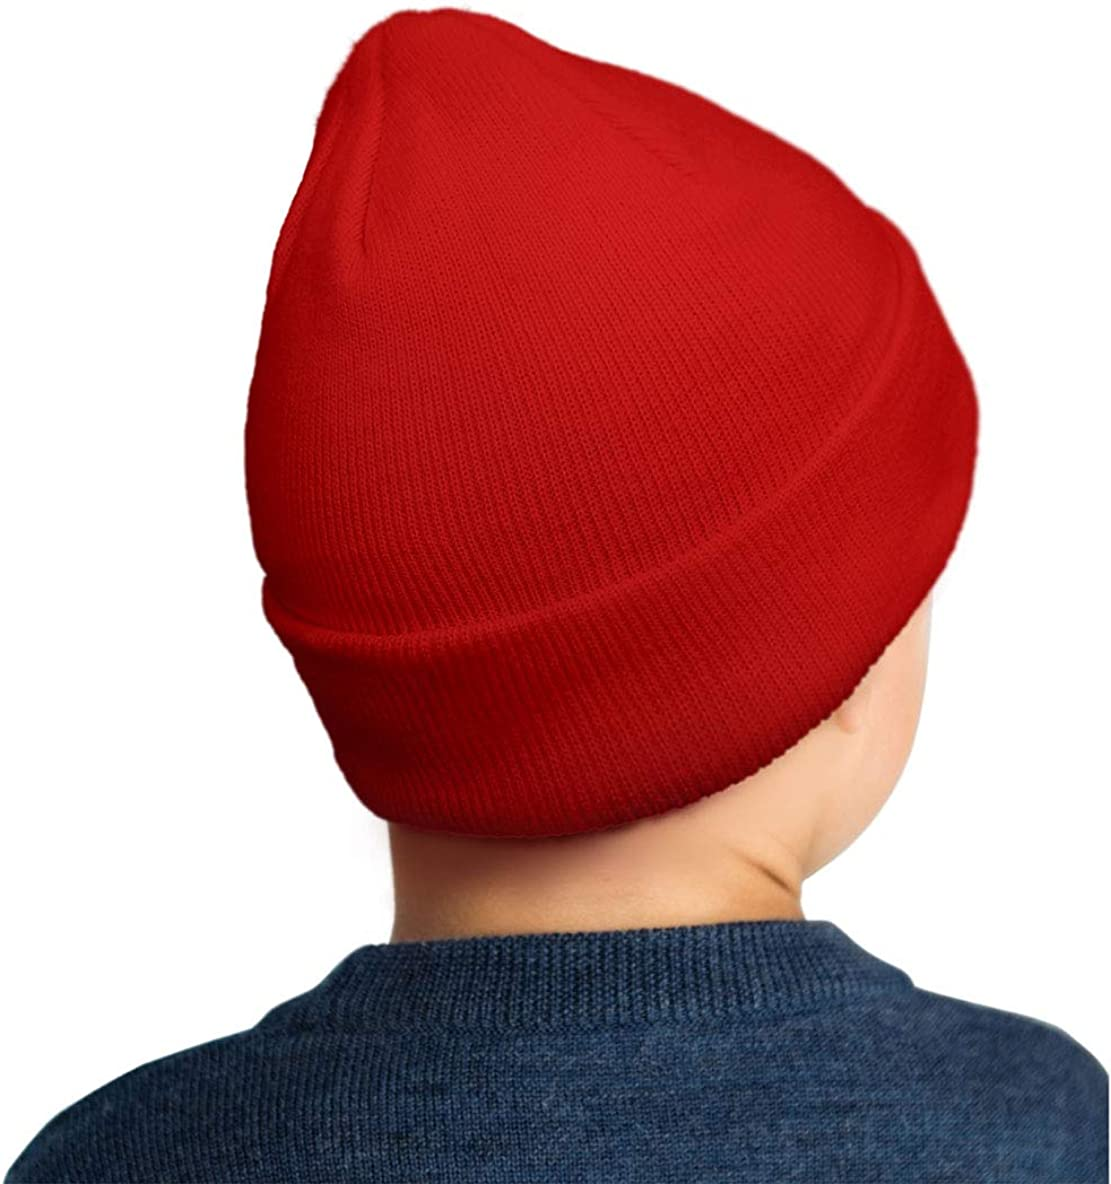 LONGCXBYUE PSE Archery PSE Logo Beanie Hats for Kids Cuffed Plain Winter Outdoor Sport Ski Knit Hats for Girls Boys